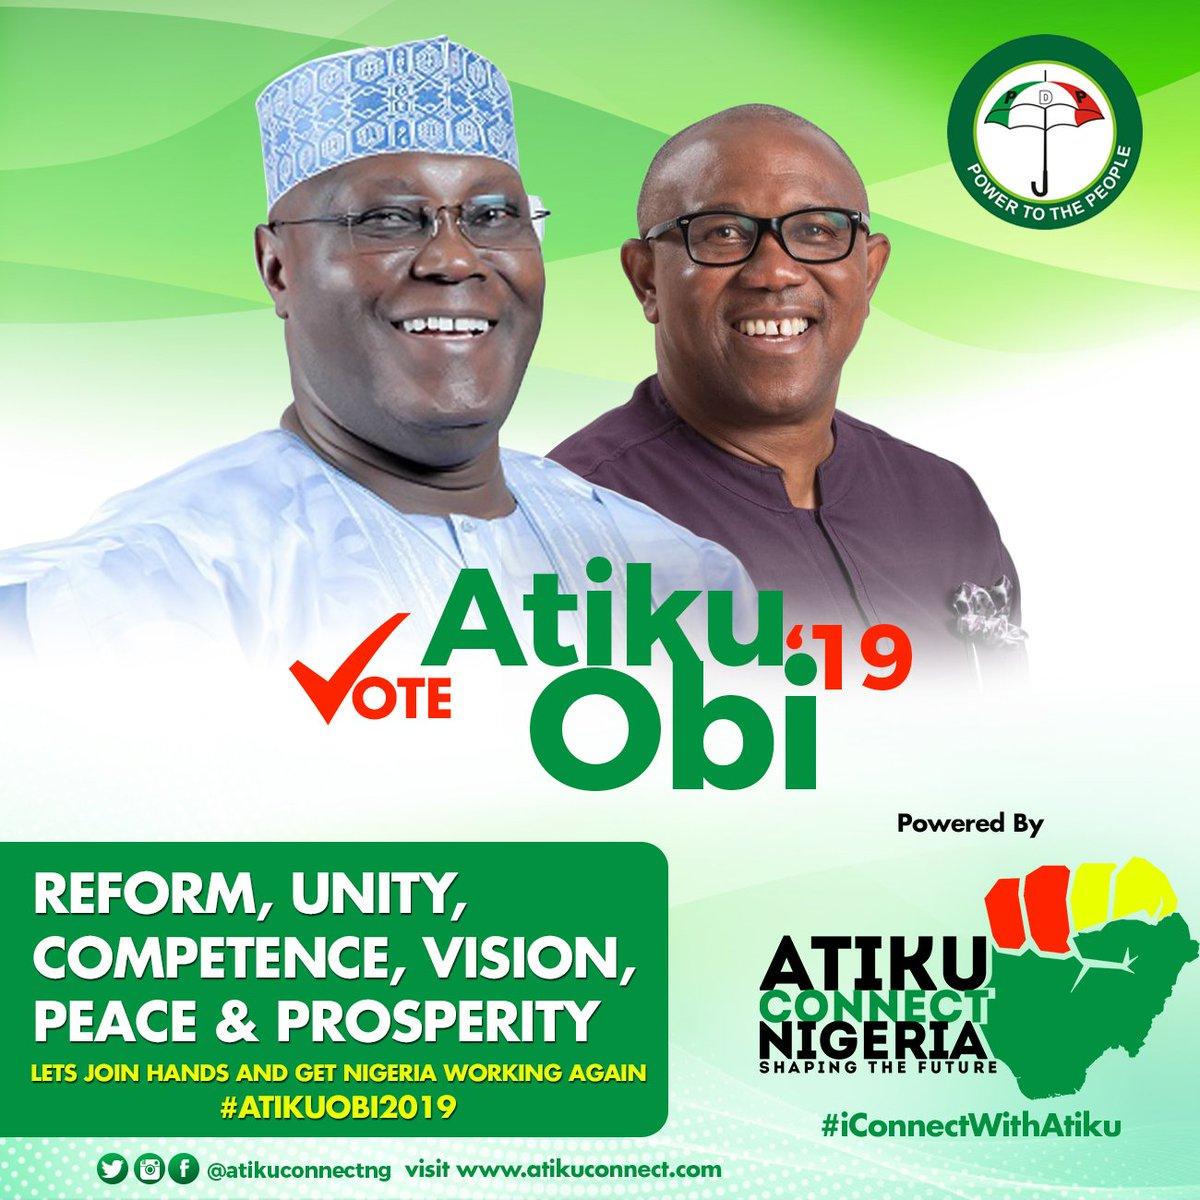 You can download a copy of The Atiku Plan to Get Nigeria Working Again via the link below  http://www. atikuconnect.com  &nbsp;  #atiku-plan  Together We can shape the future #AtikuConnect #iConnectWithAtiku #LetsGetNigeriaWorkingAgain #AtikuConnectNigeria #Atiku #AtikuObi2019 <br>http://pic.twitter.com/HyVVini08X